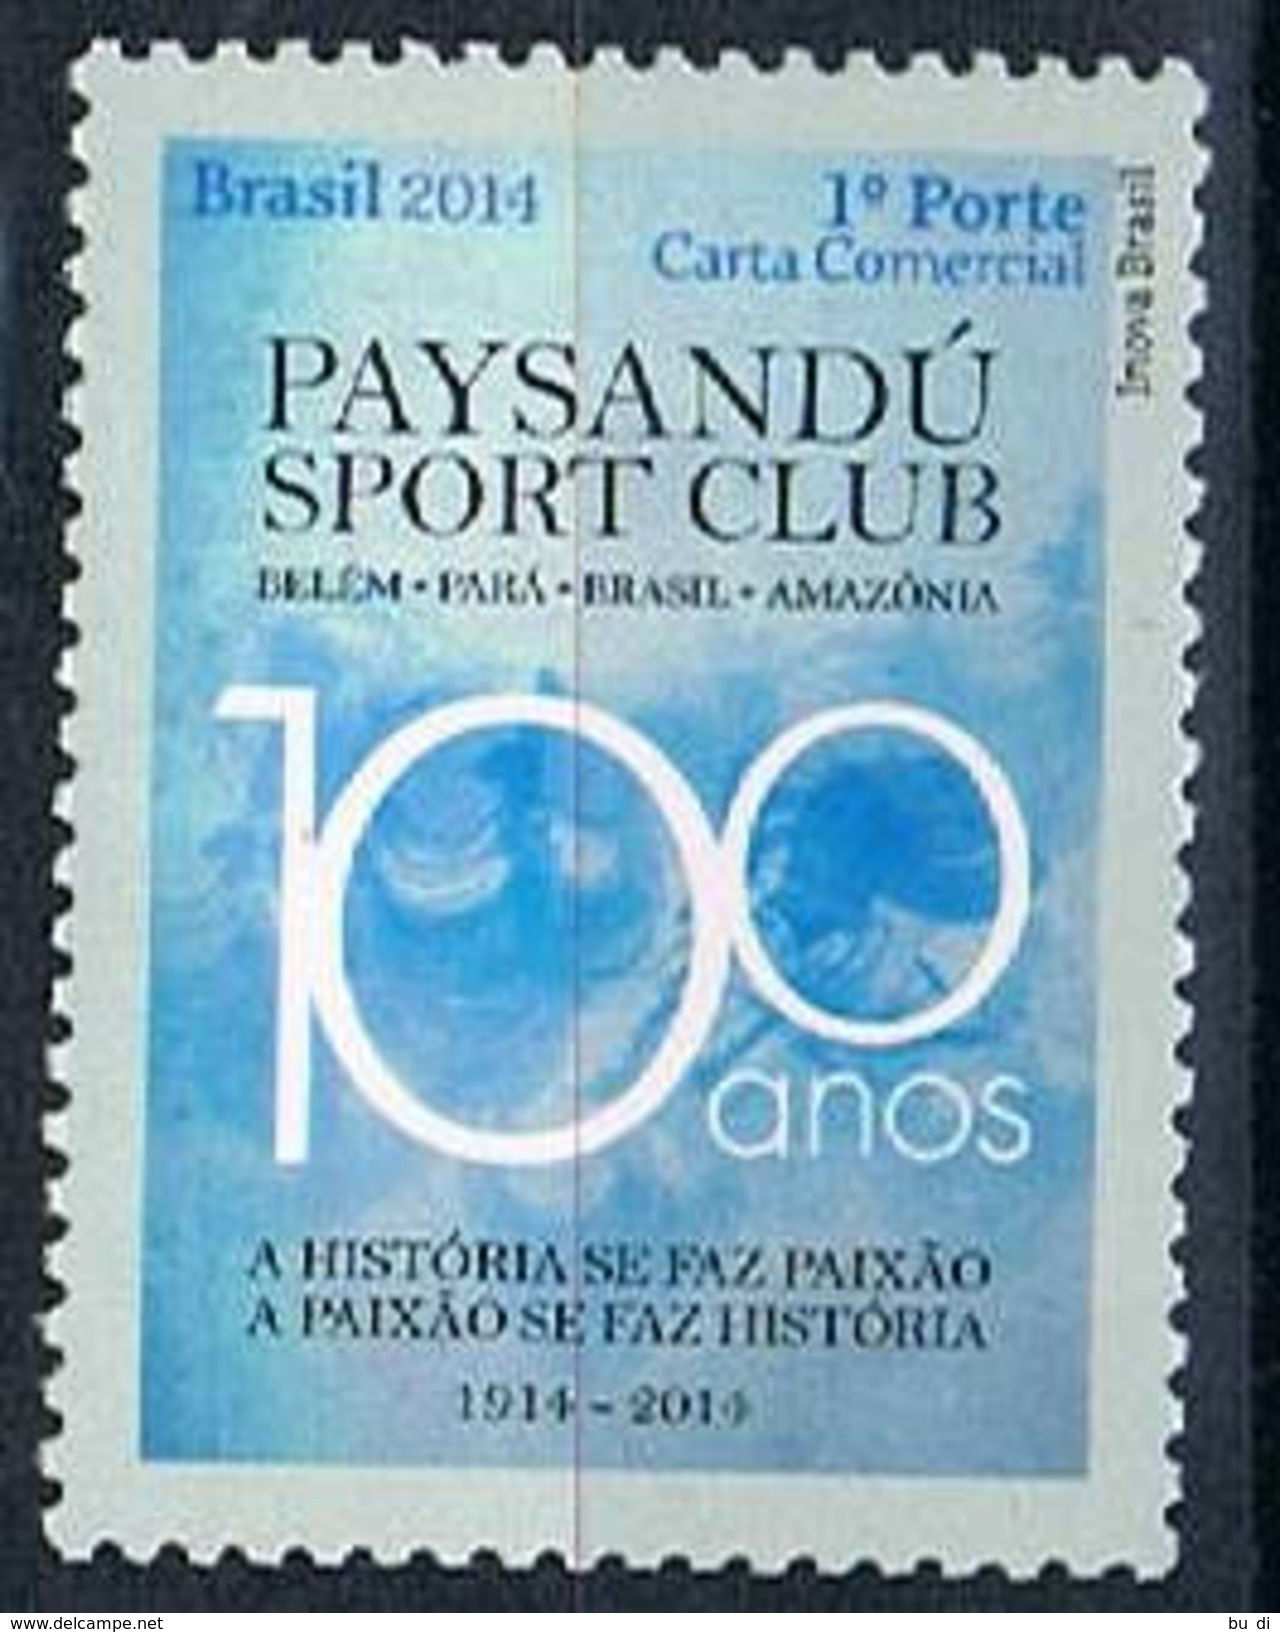 Brasilien 4139 - Paysandú Sport Club, Belém, Fußball - Brazil